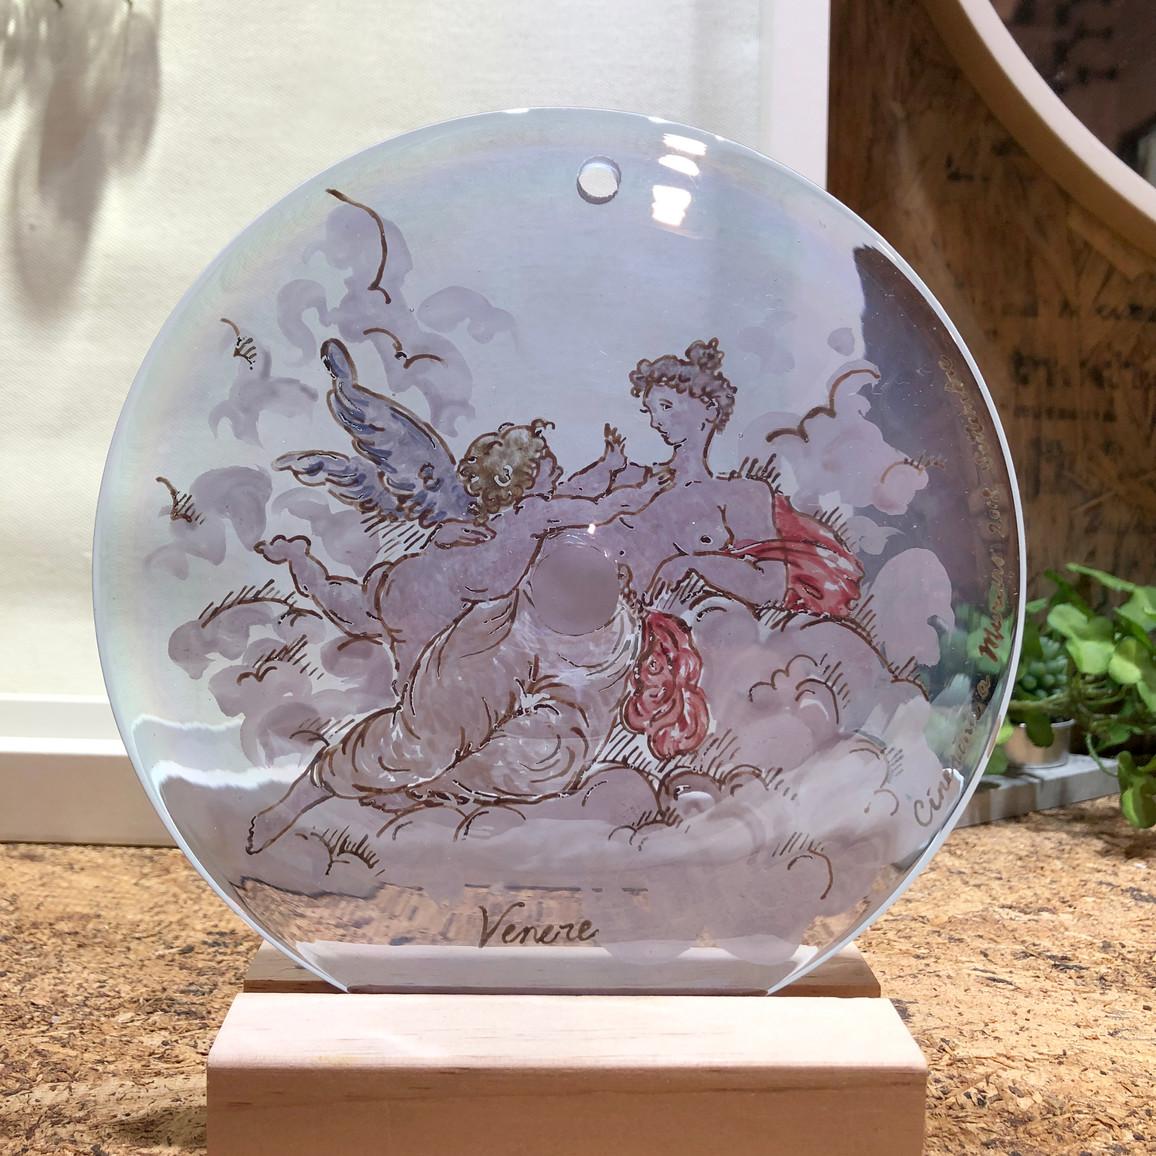 Venetian inverts glass painting